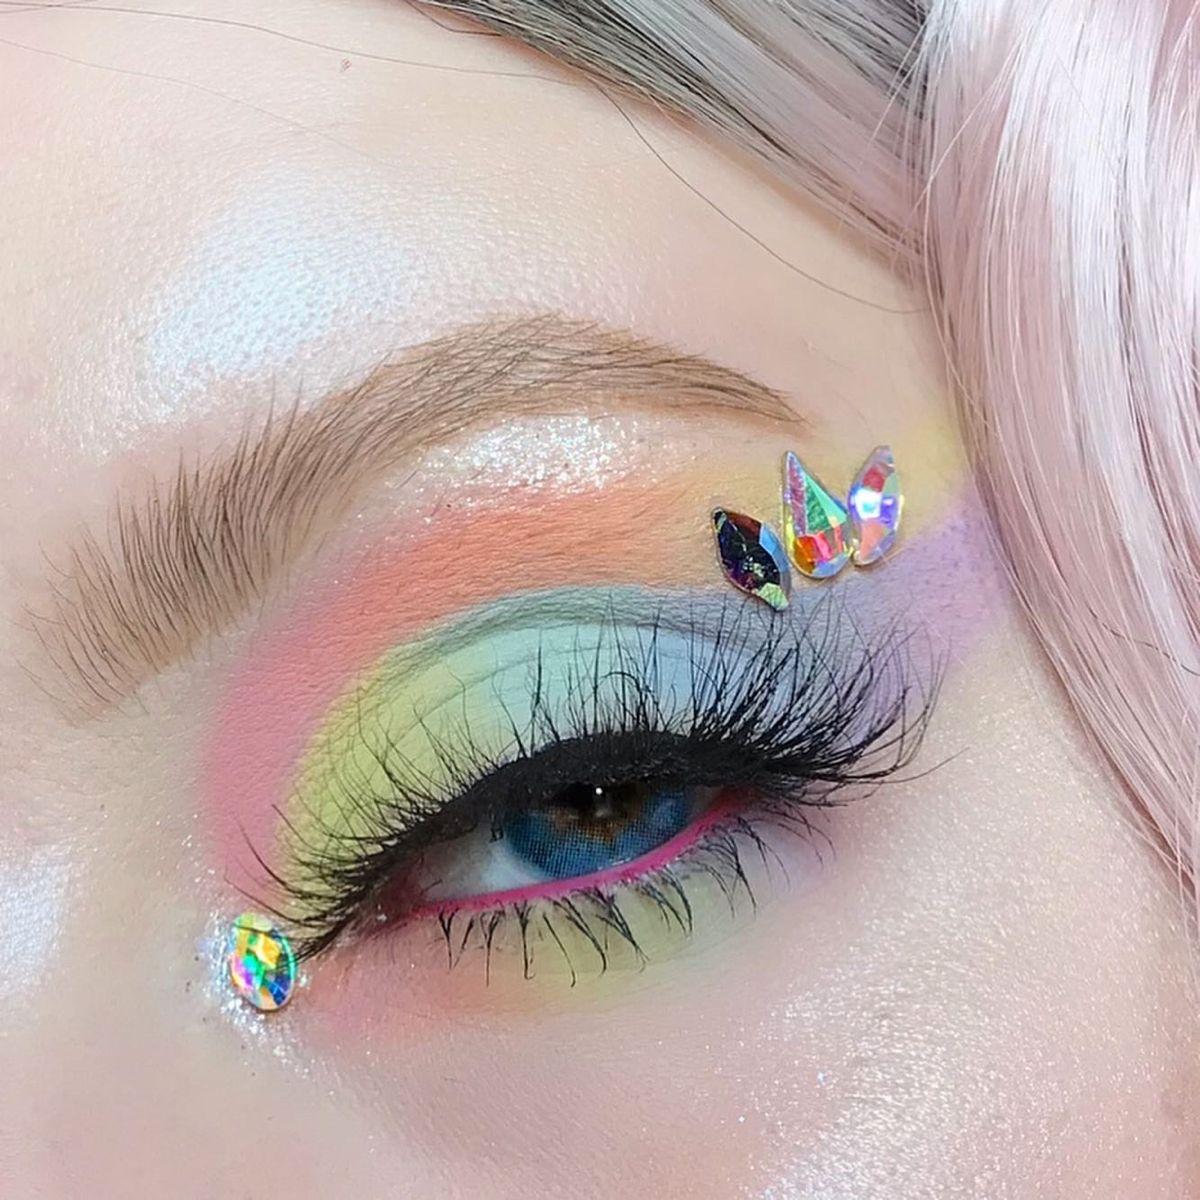 Pastel💕 Morphe 35i in 2020 Colorful makeup, Eye makeup